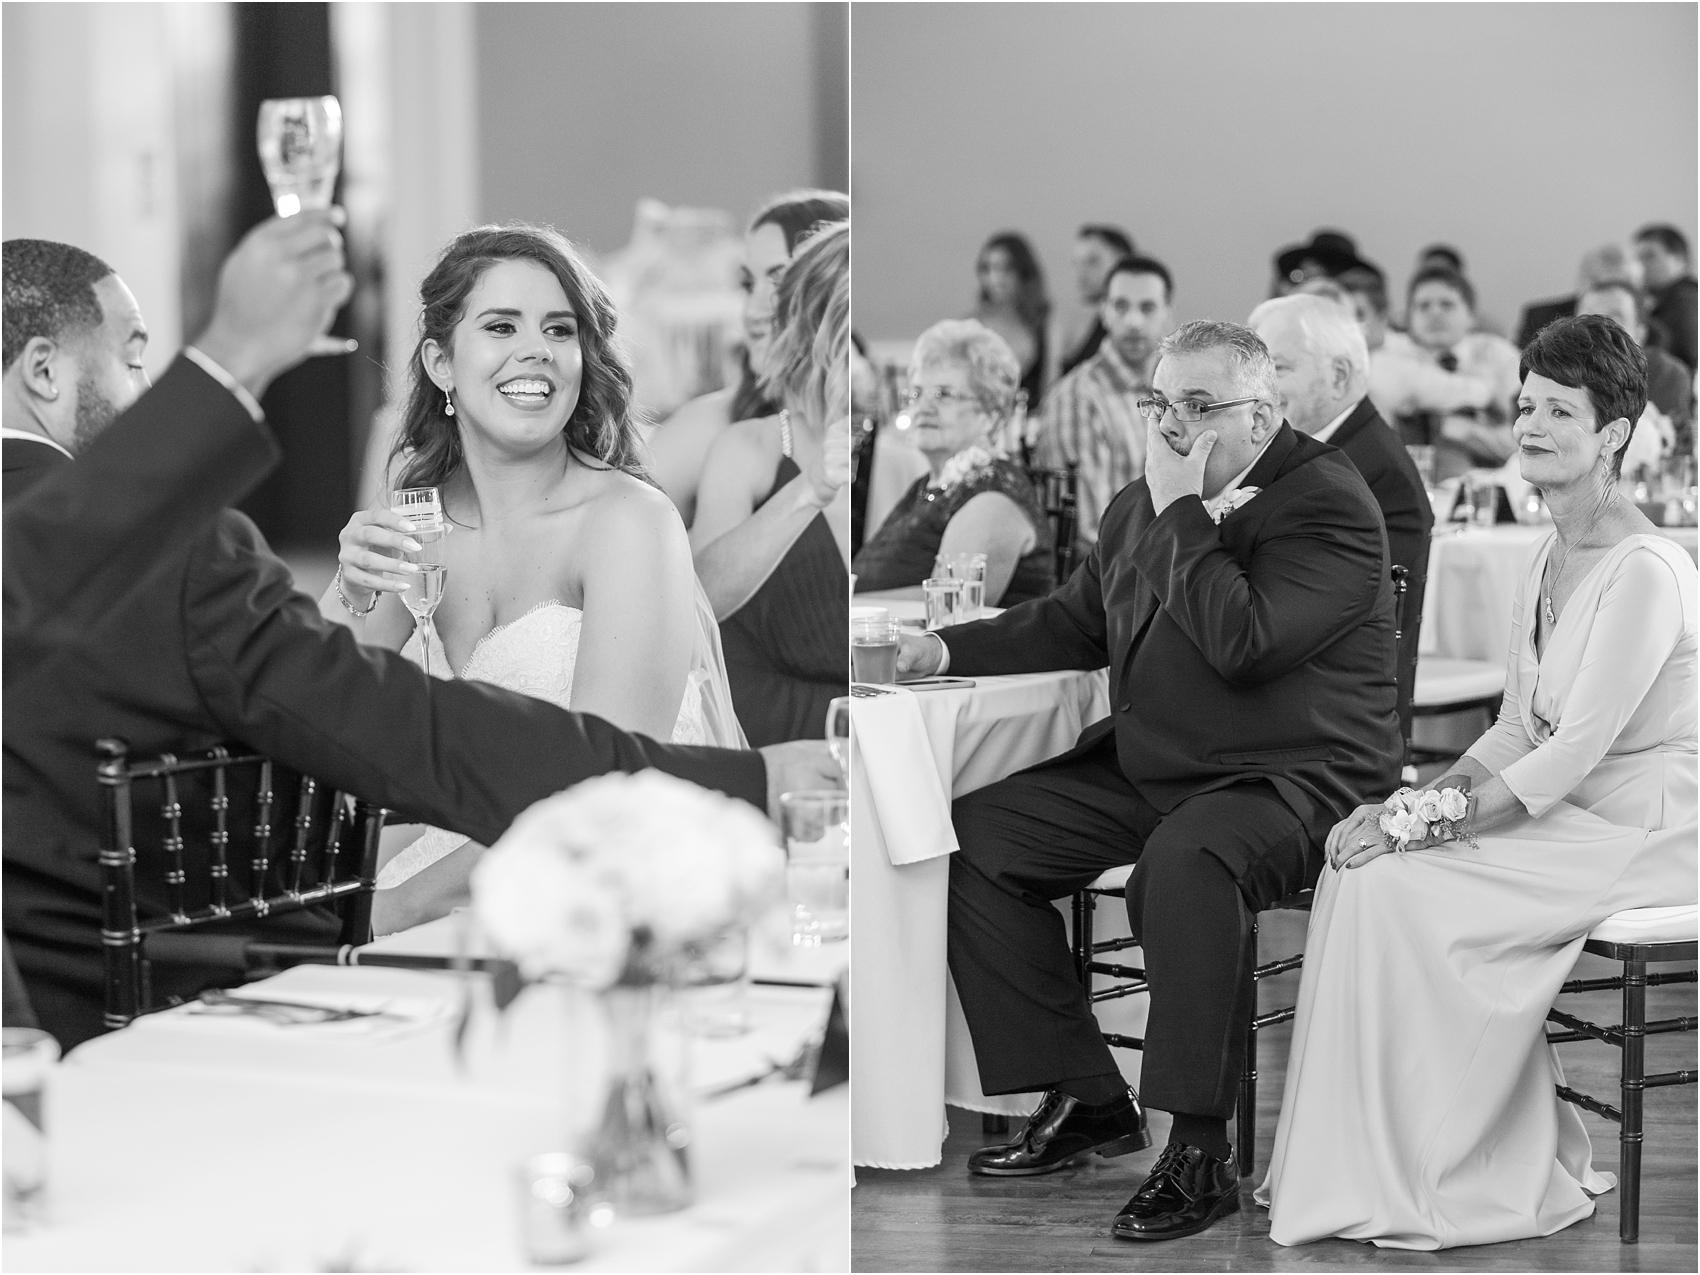 elegant-and-romantic-fall-wedding-photos-at-st-marys-catholic-church-in-monroe-michigan-by-courtney-carolyn-photography_0075.jpg